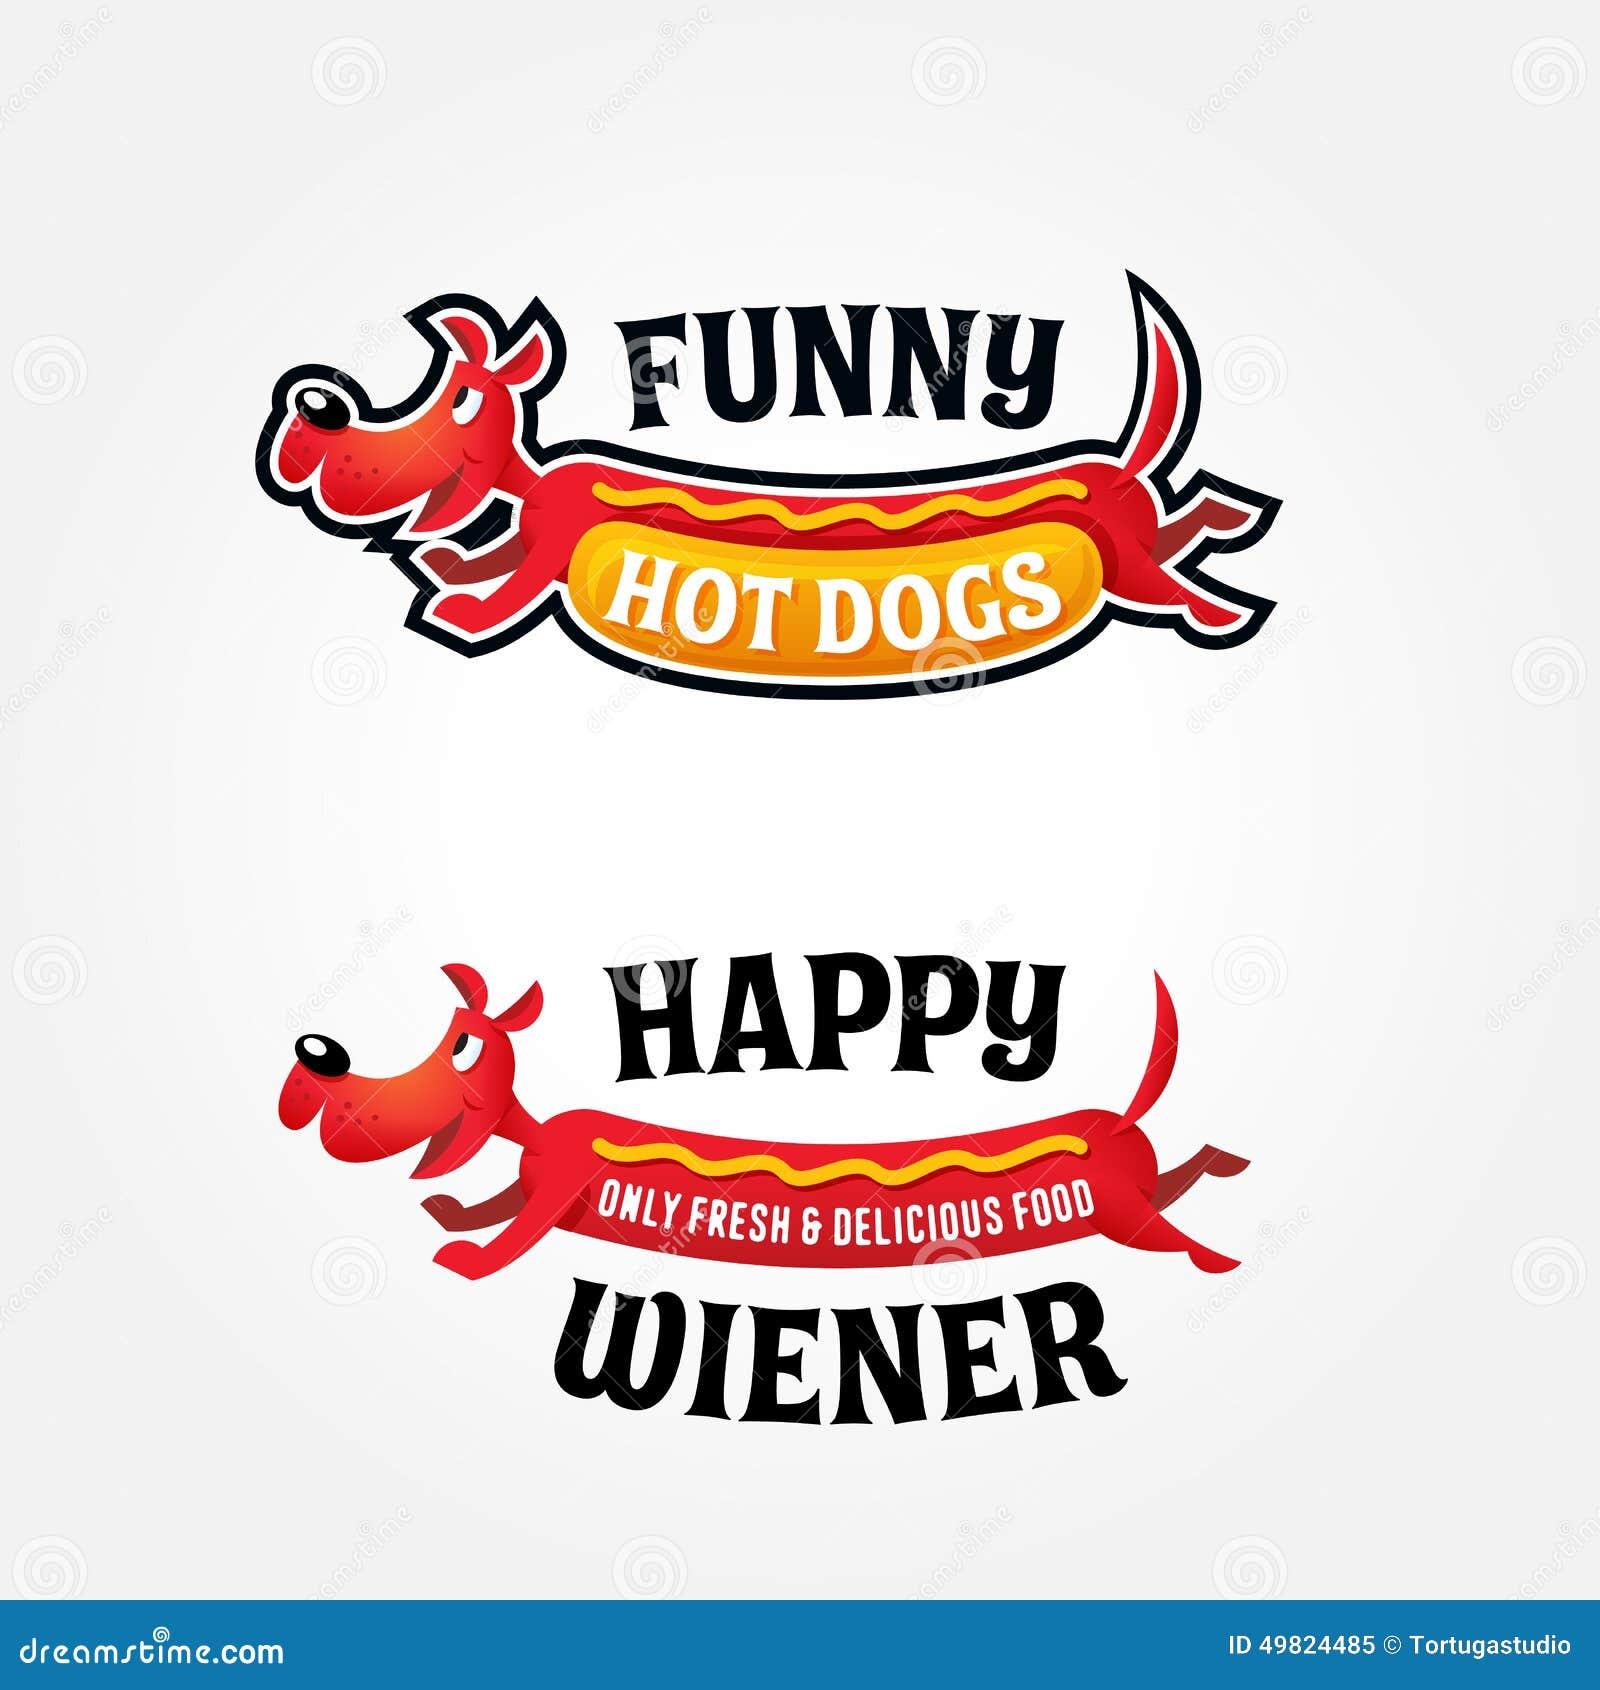 Funny Hot Dog Slogans